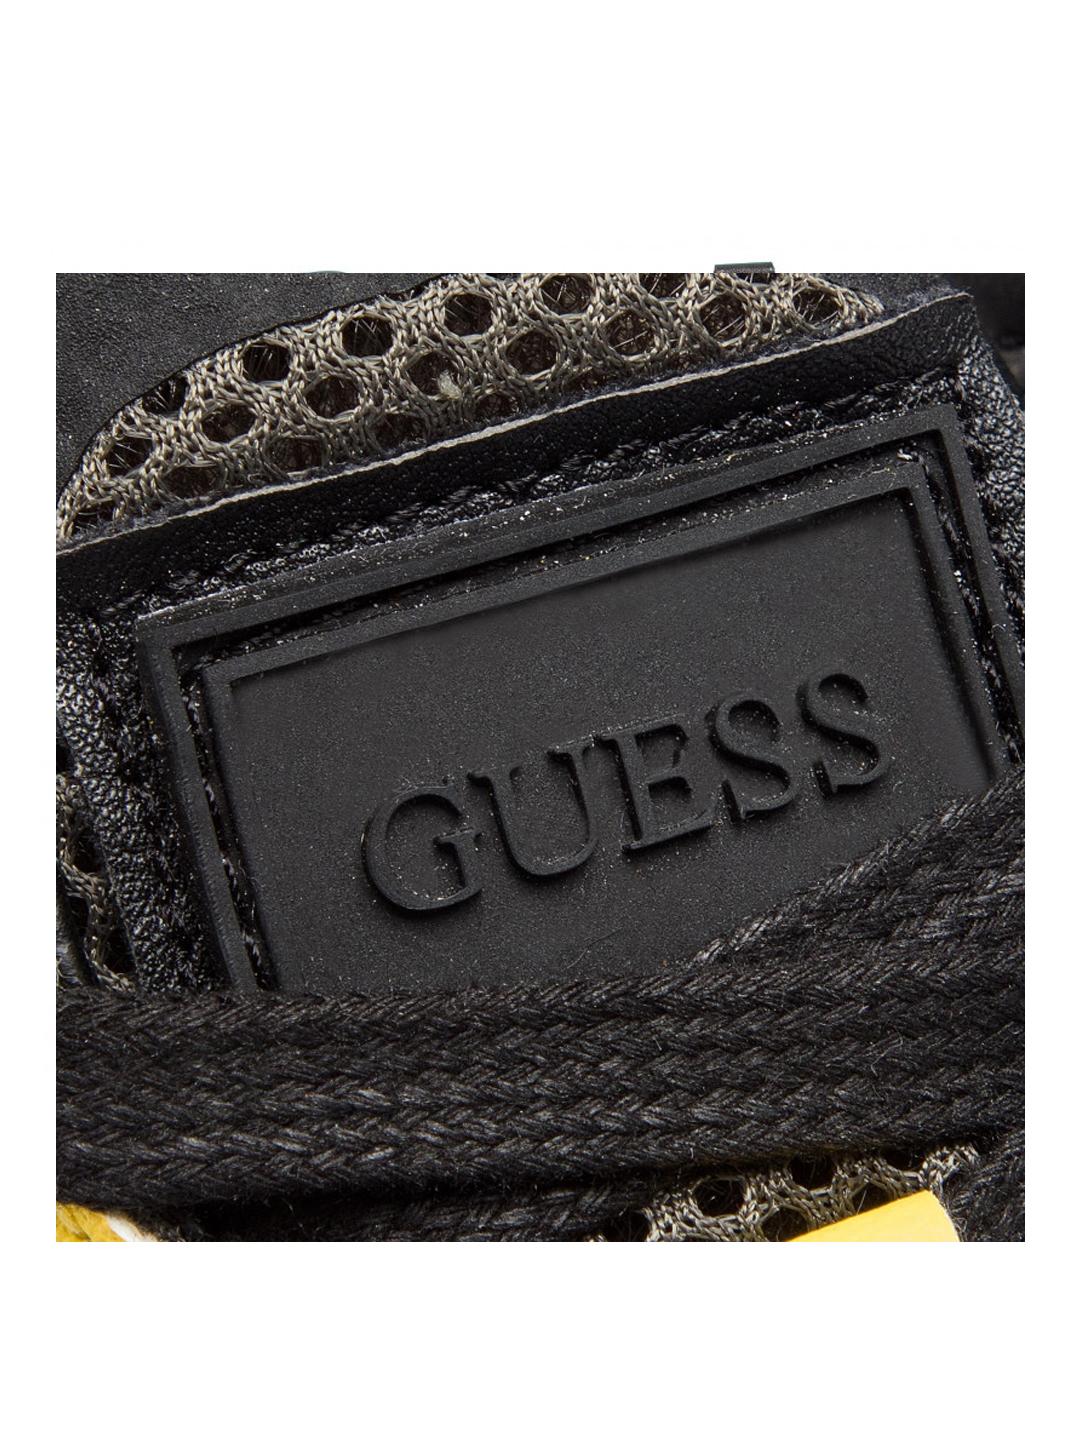 Baskets / Sport  Guess jeans FM6FIS FAB12 FISHNET BLKYE